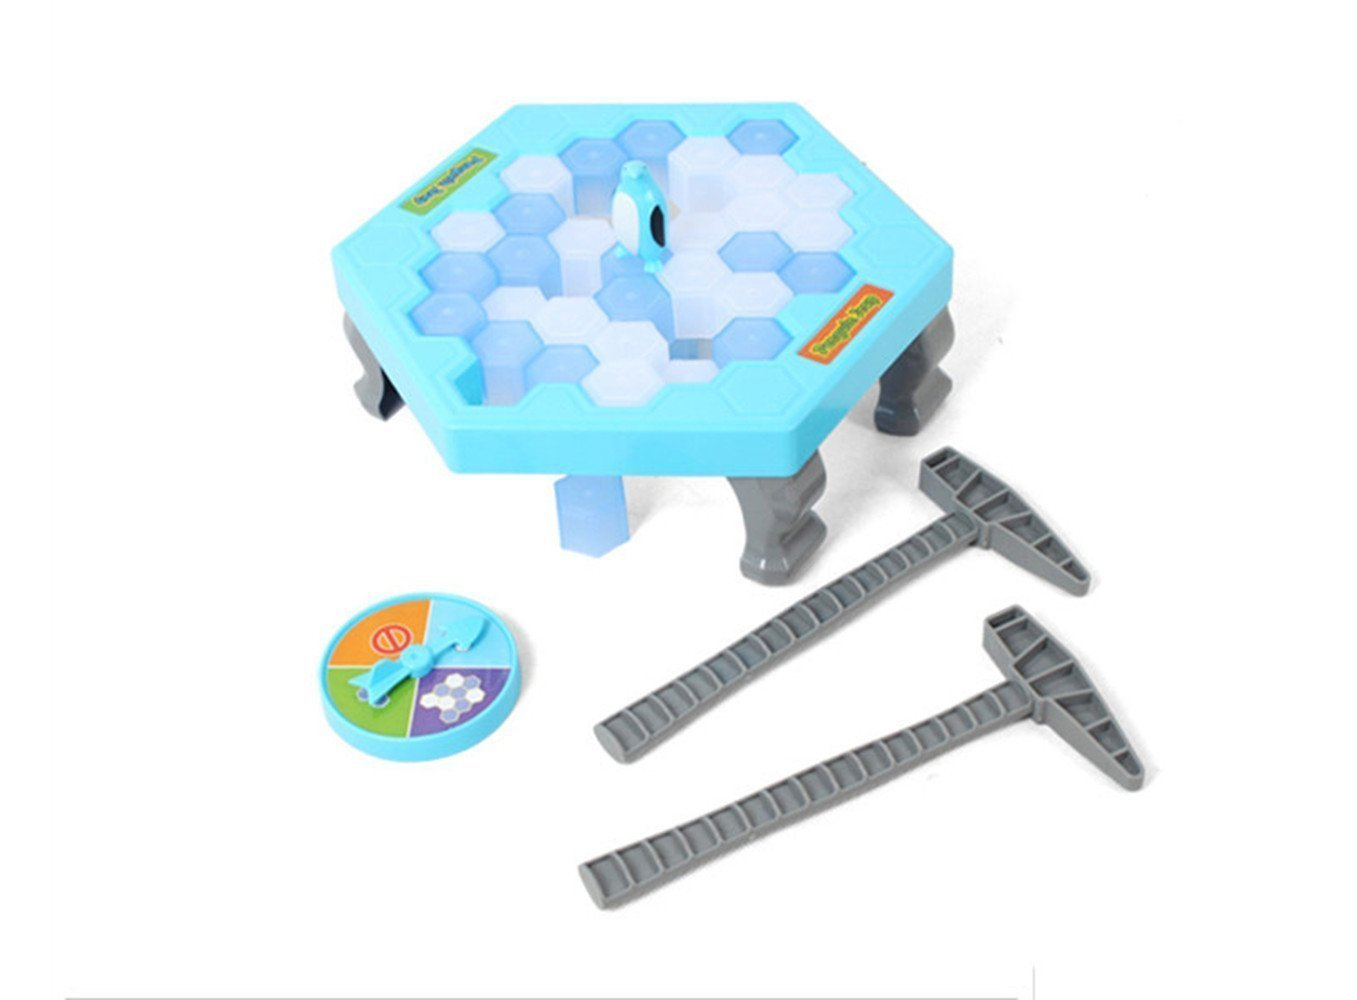 5 x Lego Black ROOF TILE 2X2//45 degrees INV 366026 Parts /& Pieces